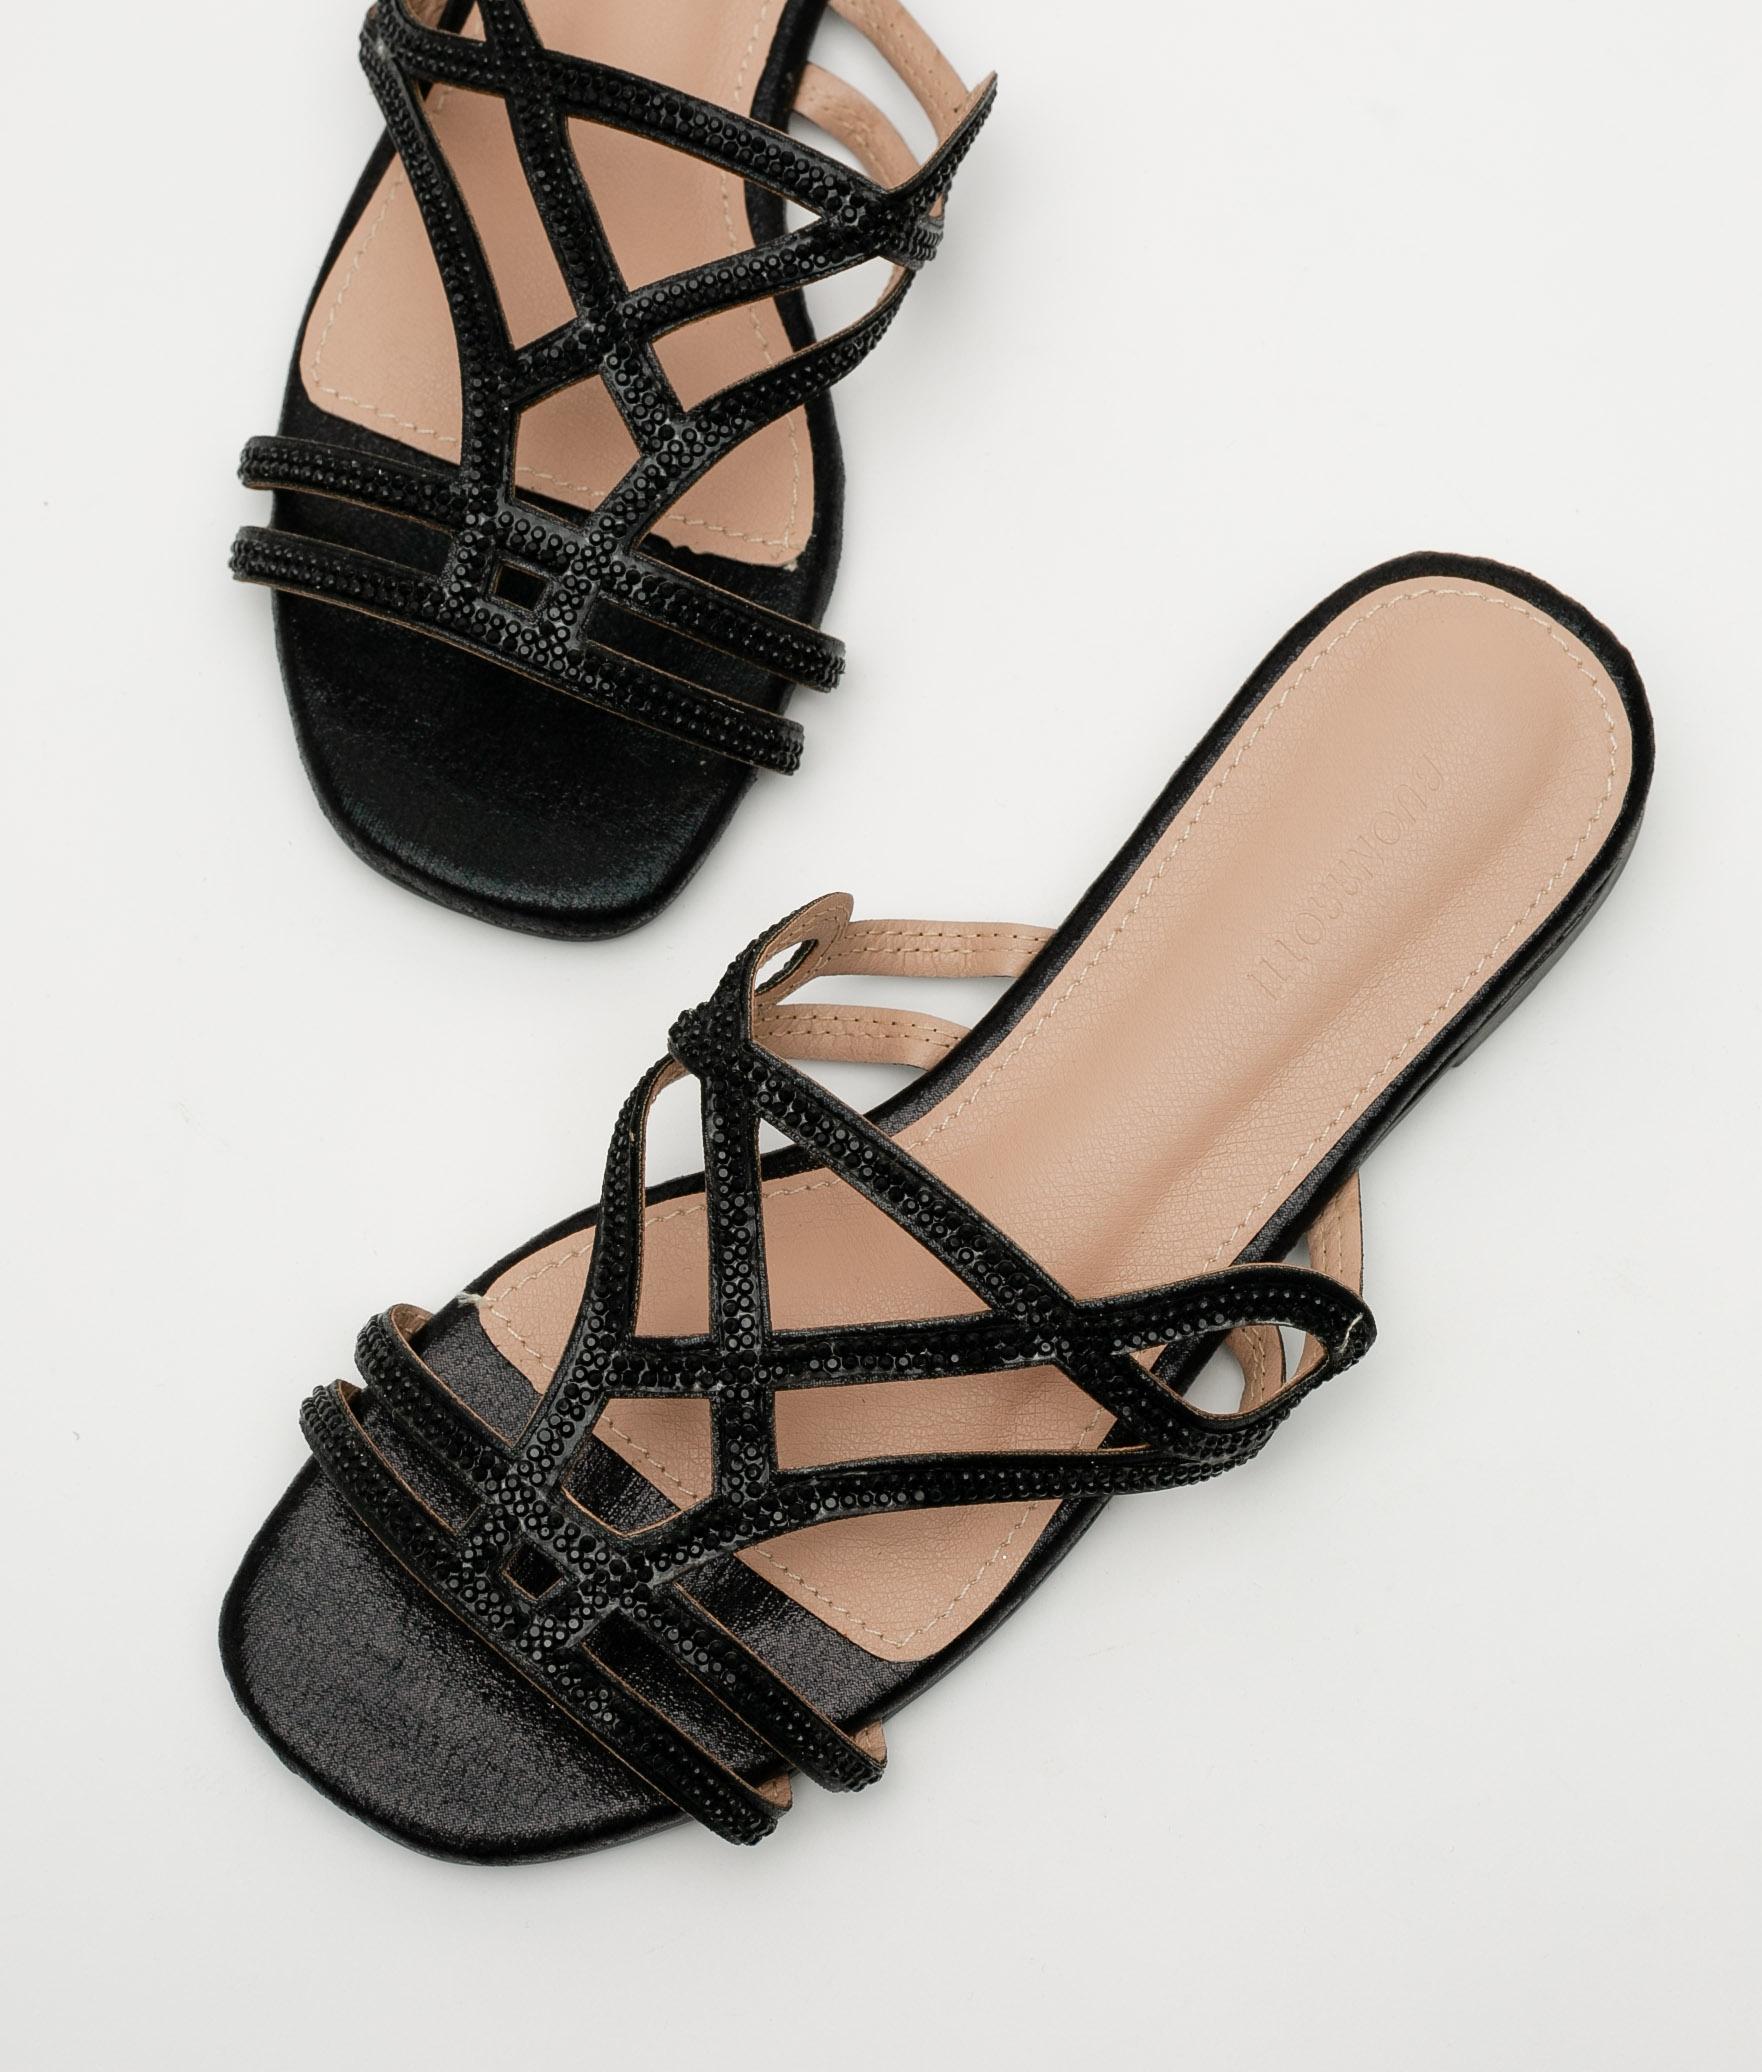 MALINAS SANDAL - BLACK